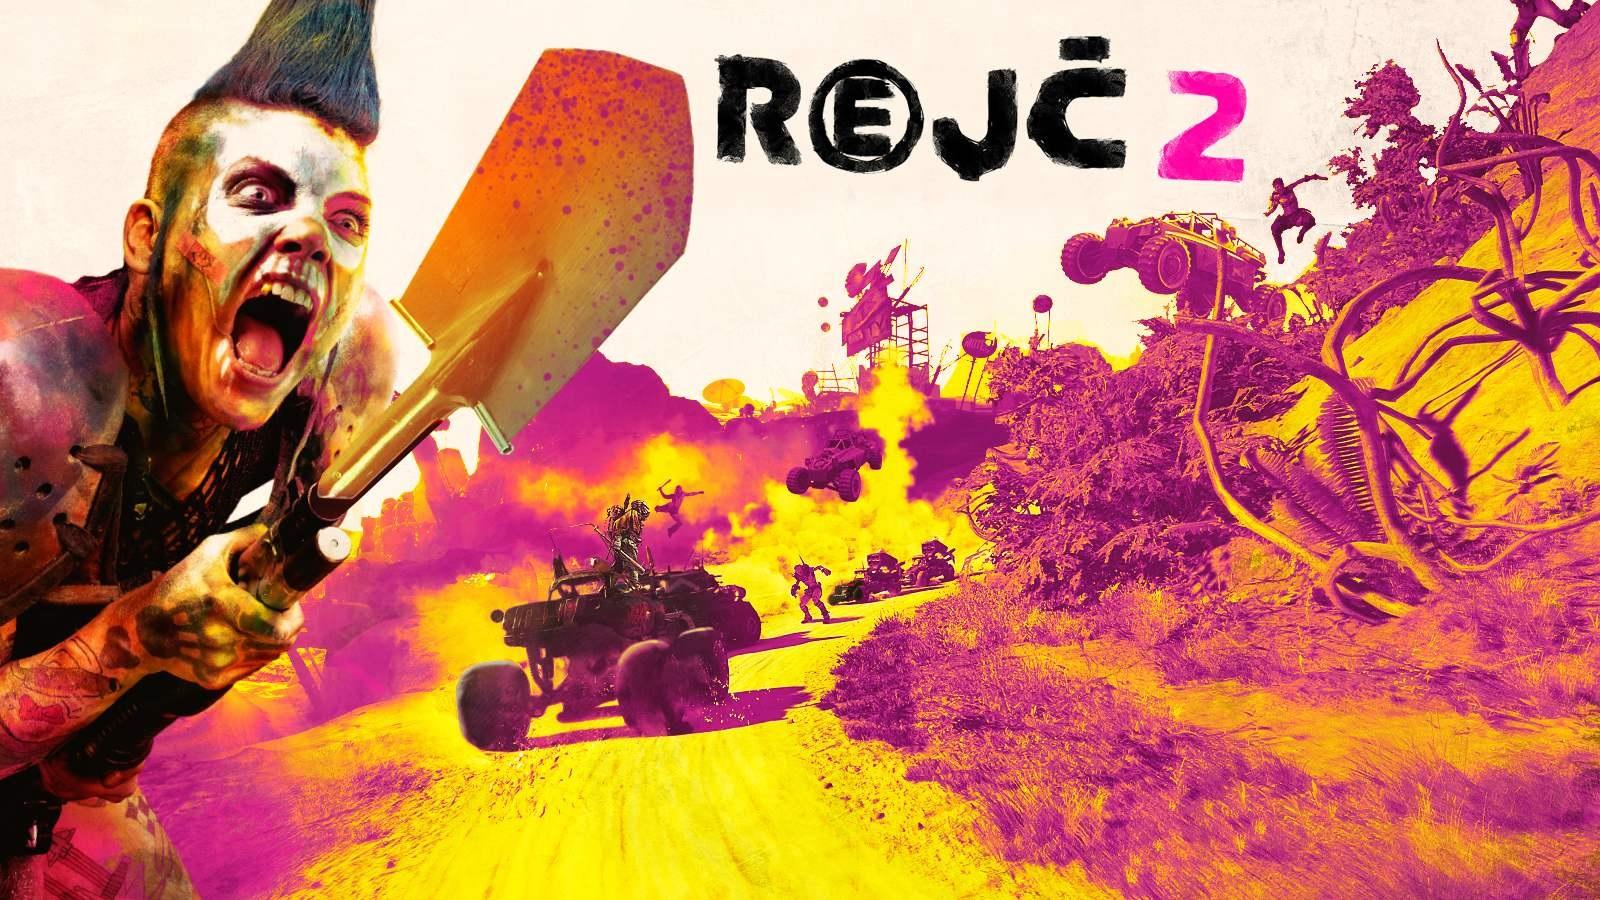 Rejč 2; screenshot: cover